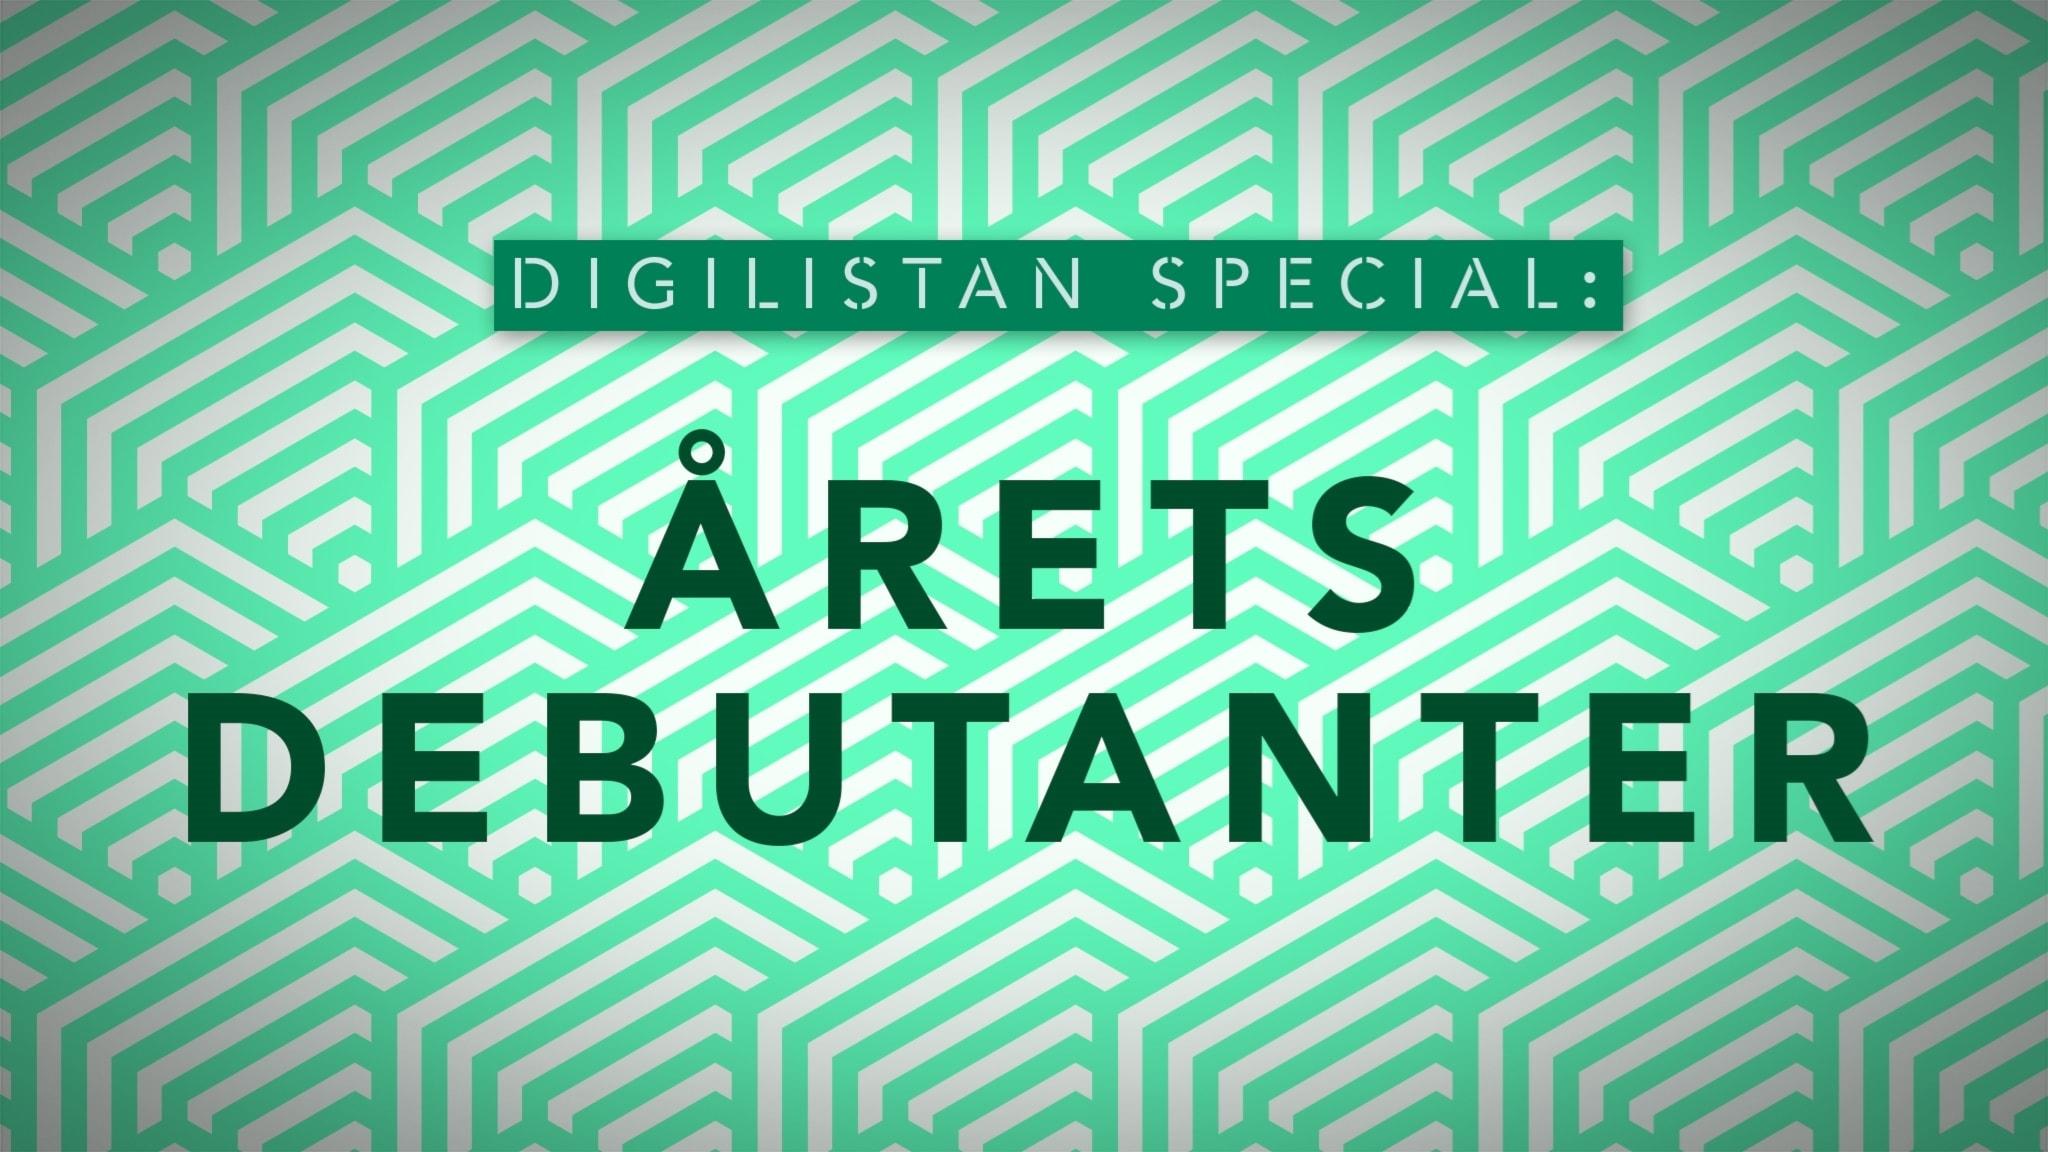 Digilistan special: Årets debutanter